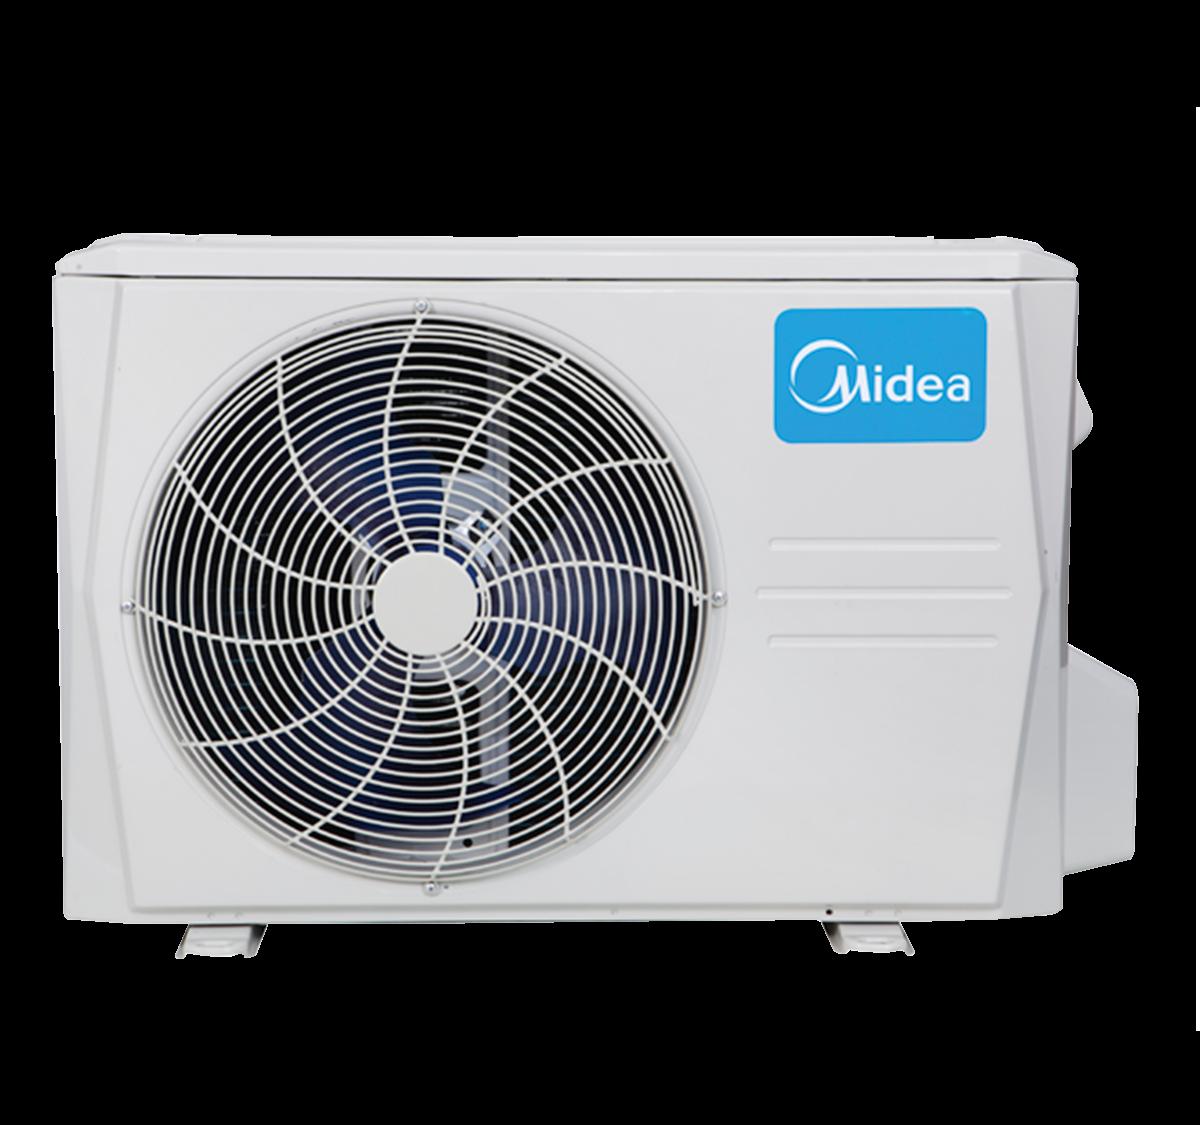 aire acondicionado unidad exterior midea inverter mob01 09hfn8 qrd6gw modelo vertu plus 26 09 n8